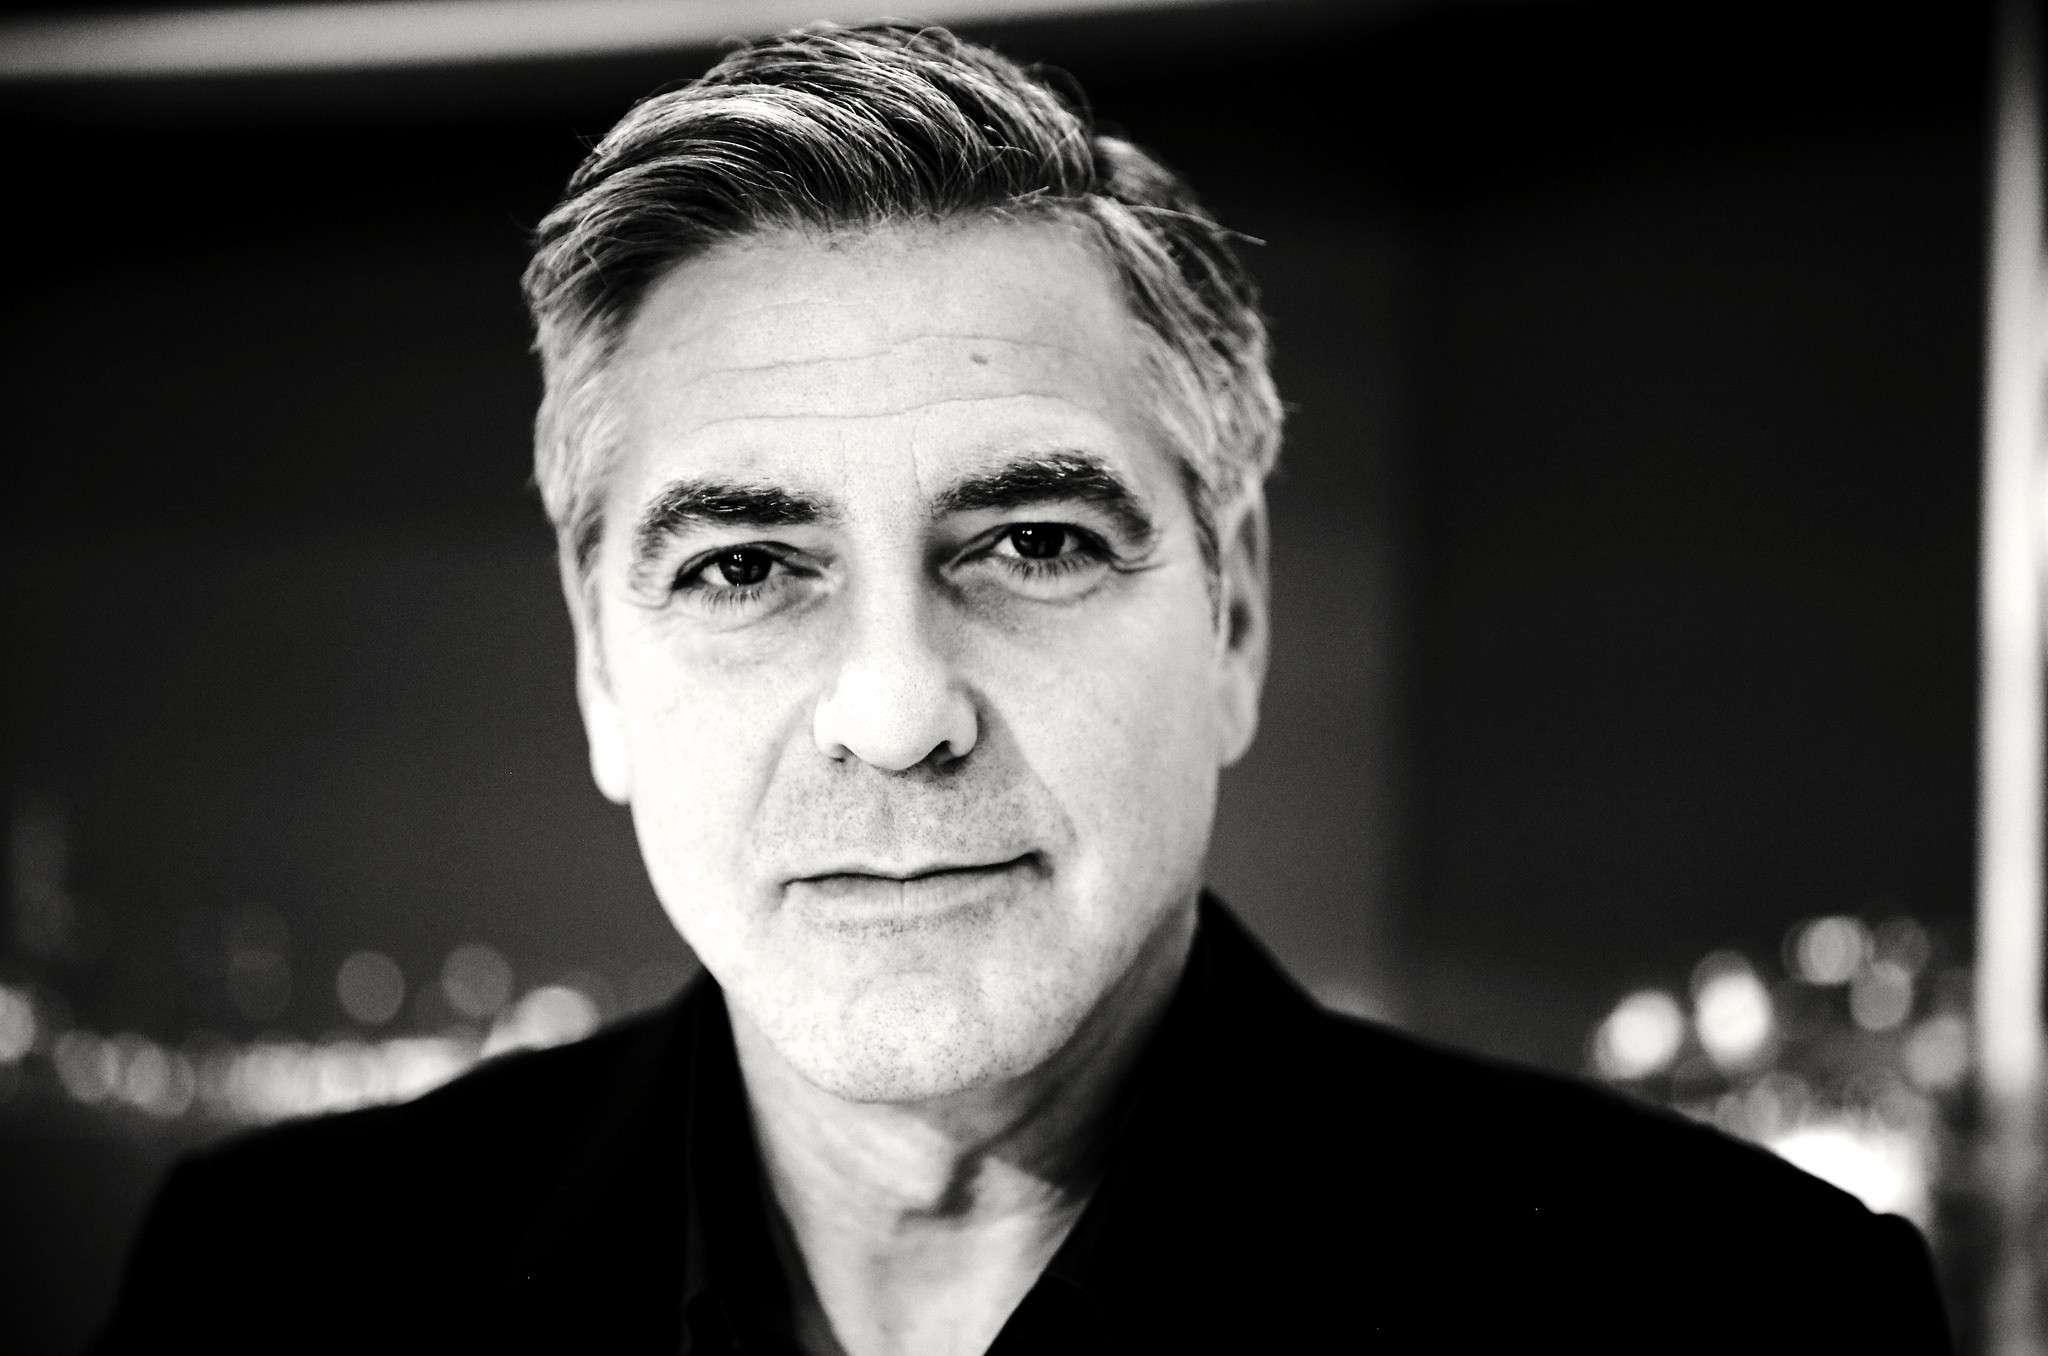 Berlinale: George Clooney Official Portrait Photo 12484810